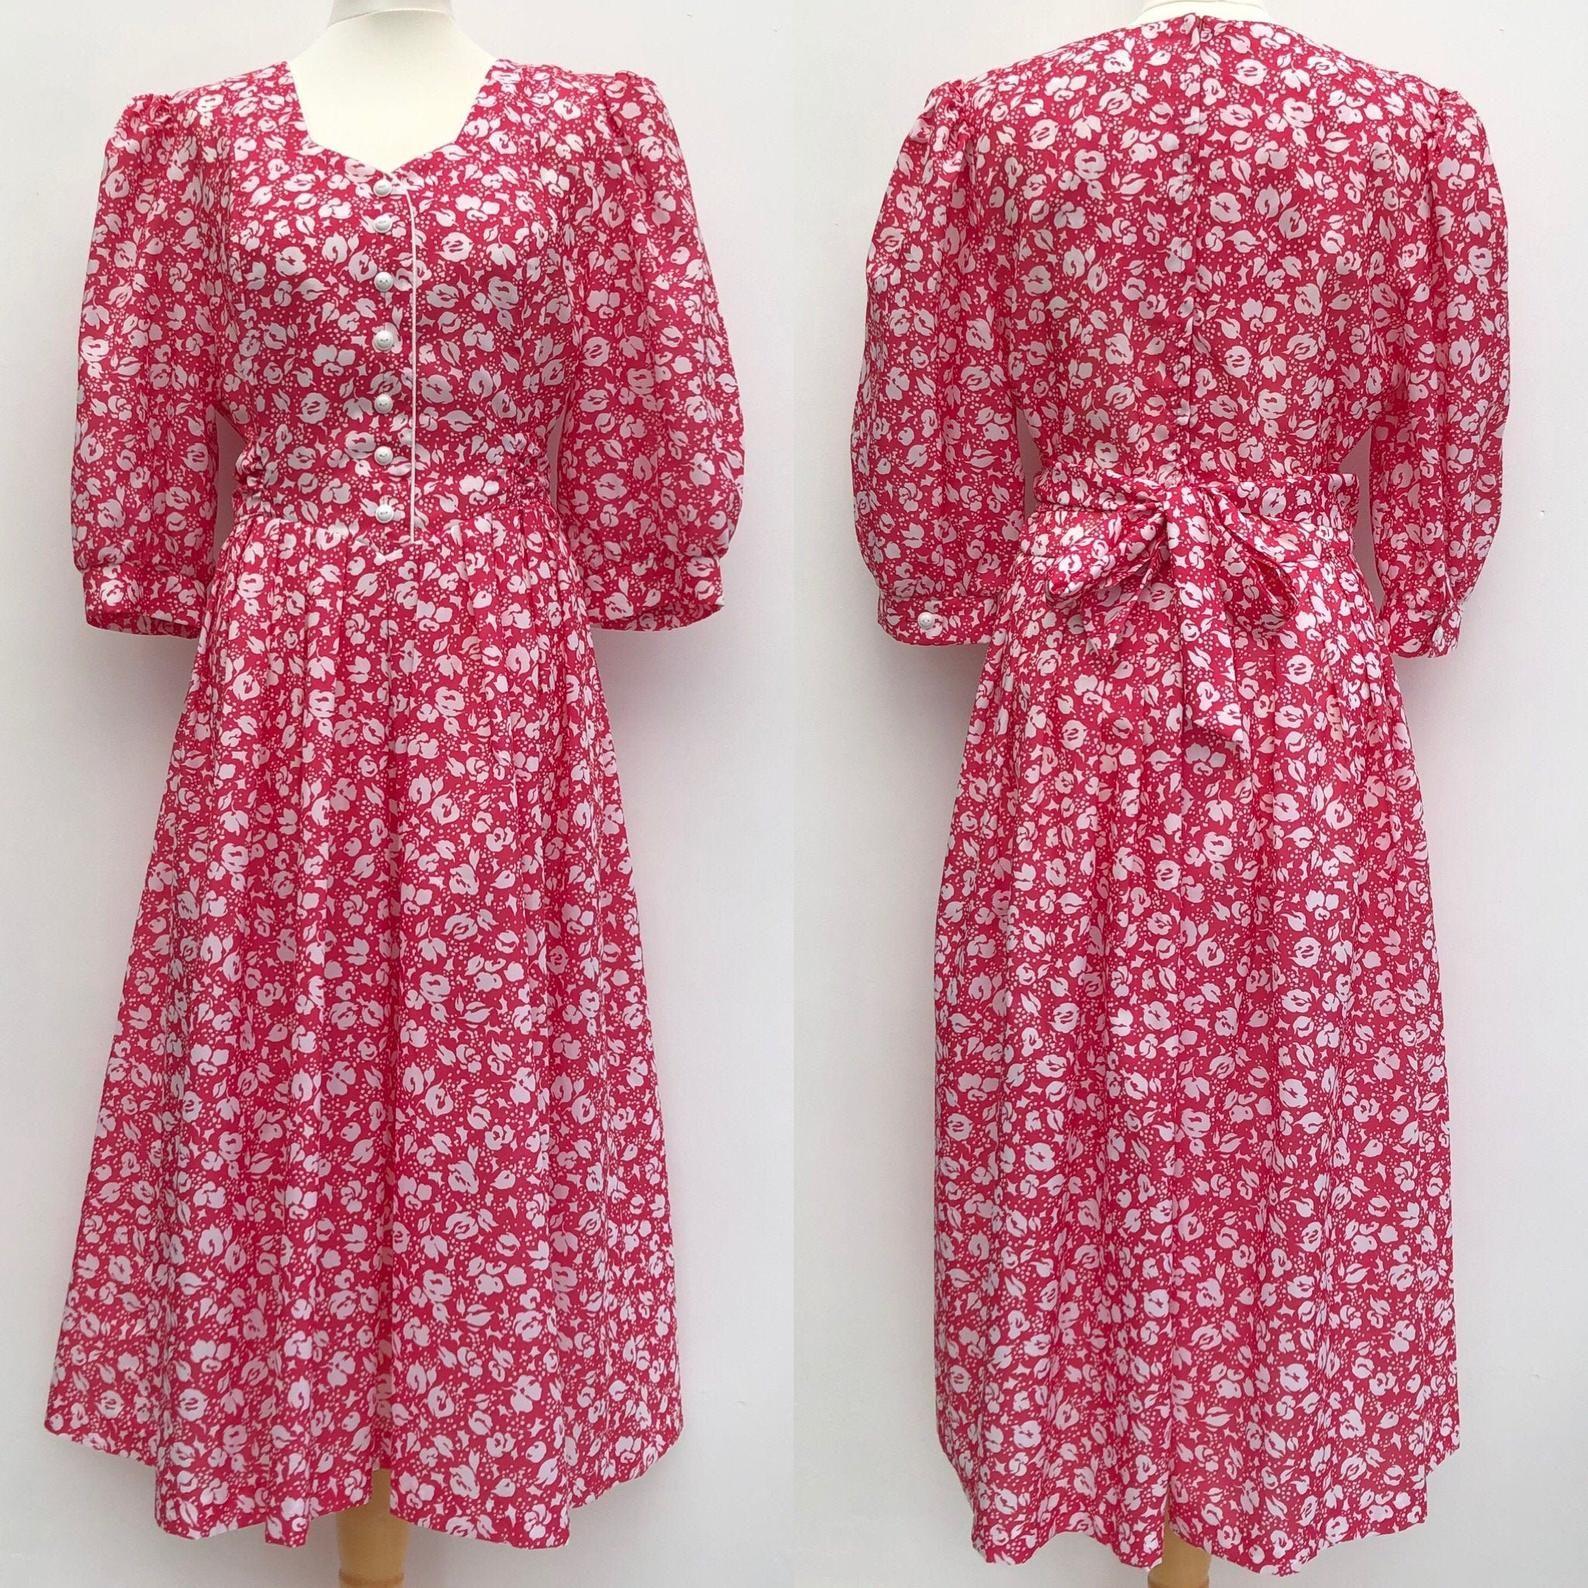 Vintage 80s Kerena Floral Midi Dress Vintage Clothing Uk Etsy In 2020 Floral Midi Dress Midi Dress Dresses